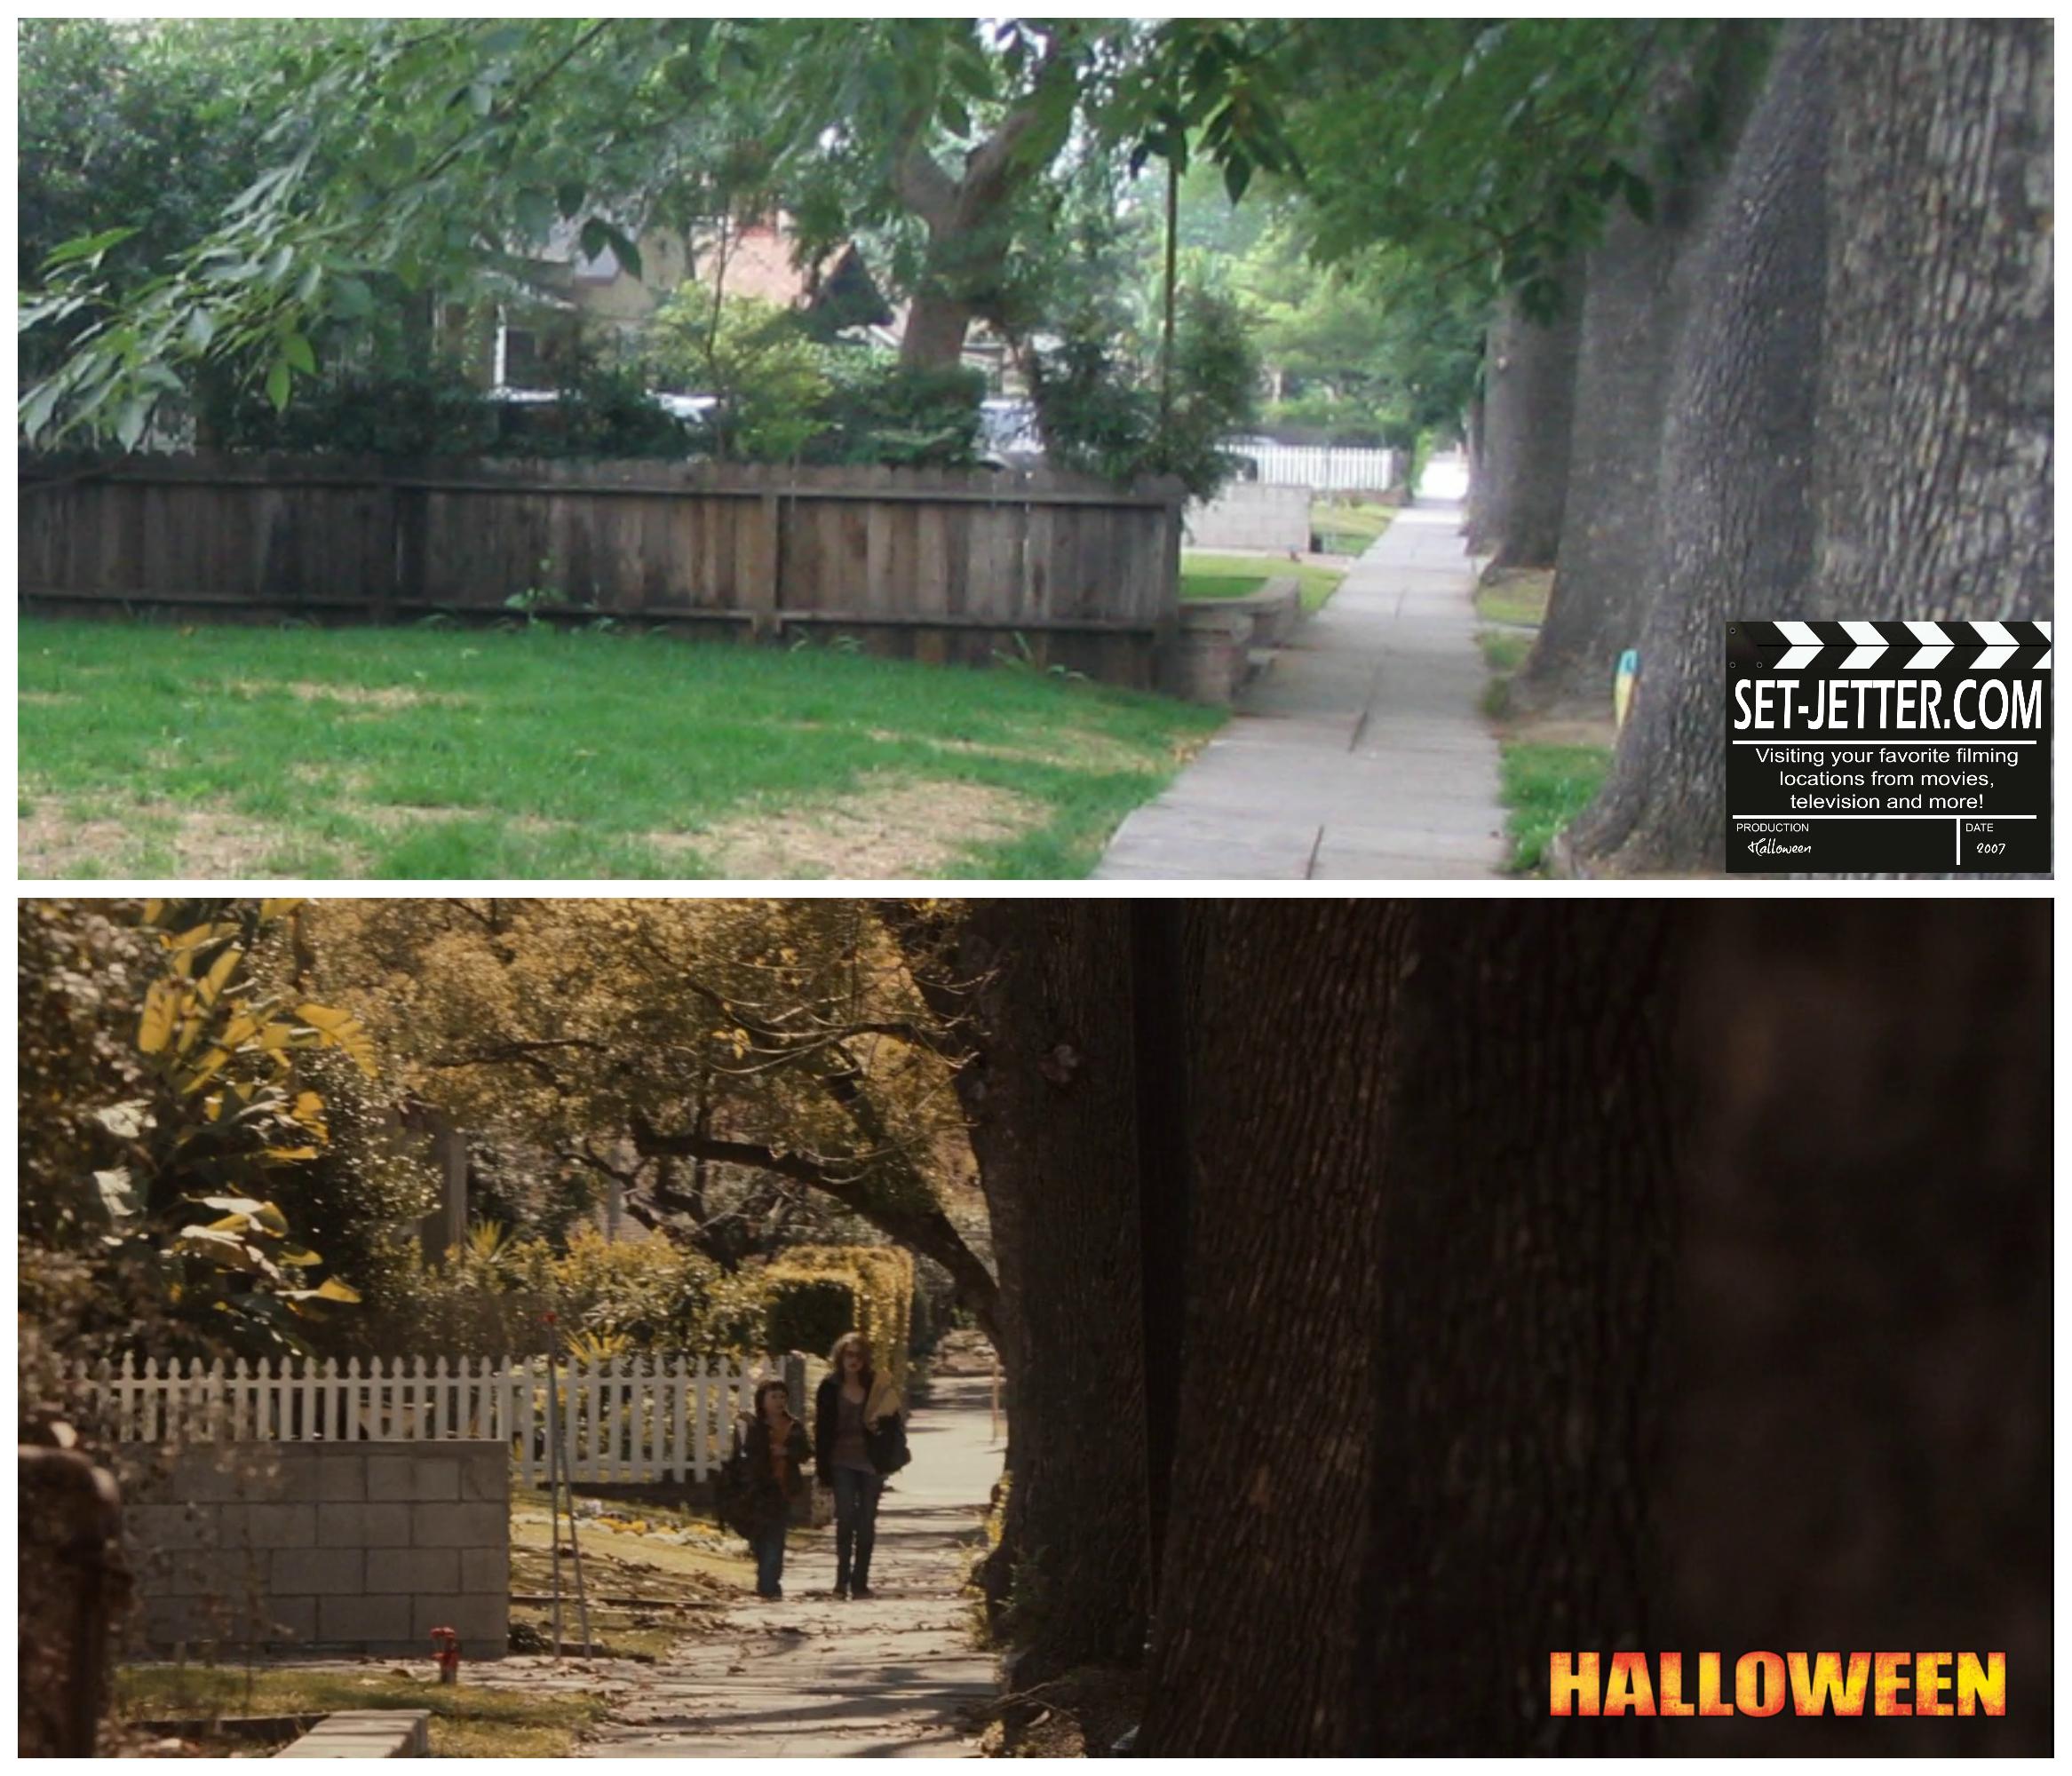 Halloween 2007 comparison 11.jpg